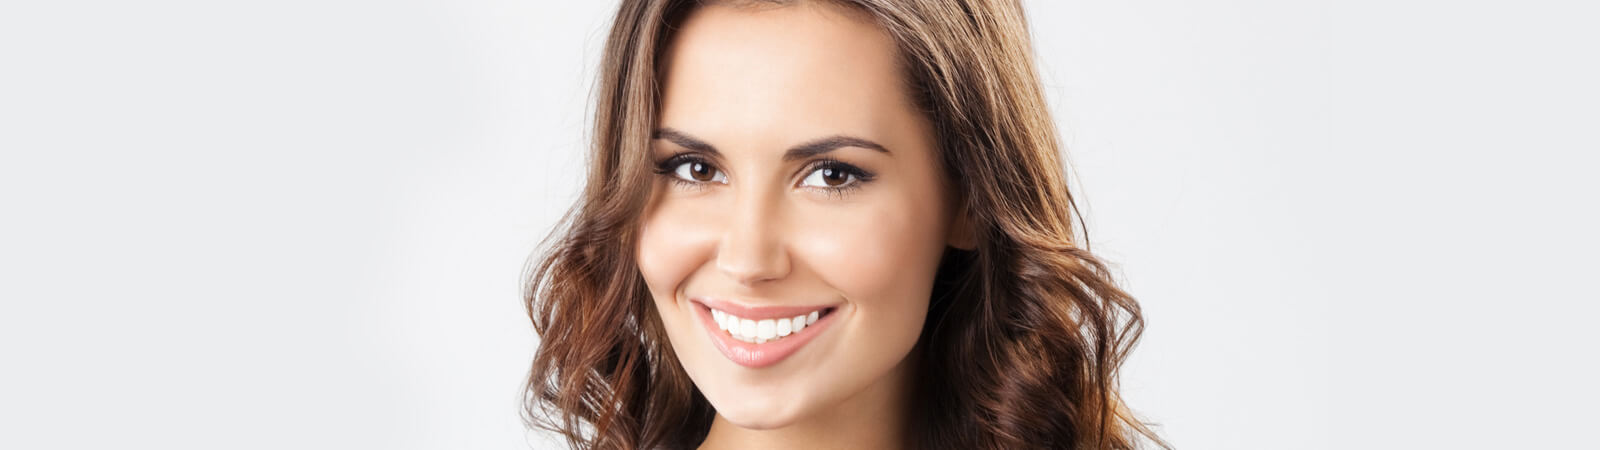 Cosmetic Dentistry - Vivid Dental, Houston TX